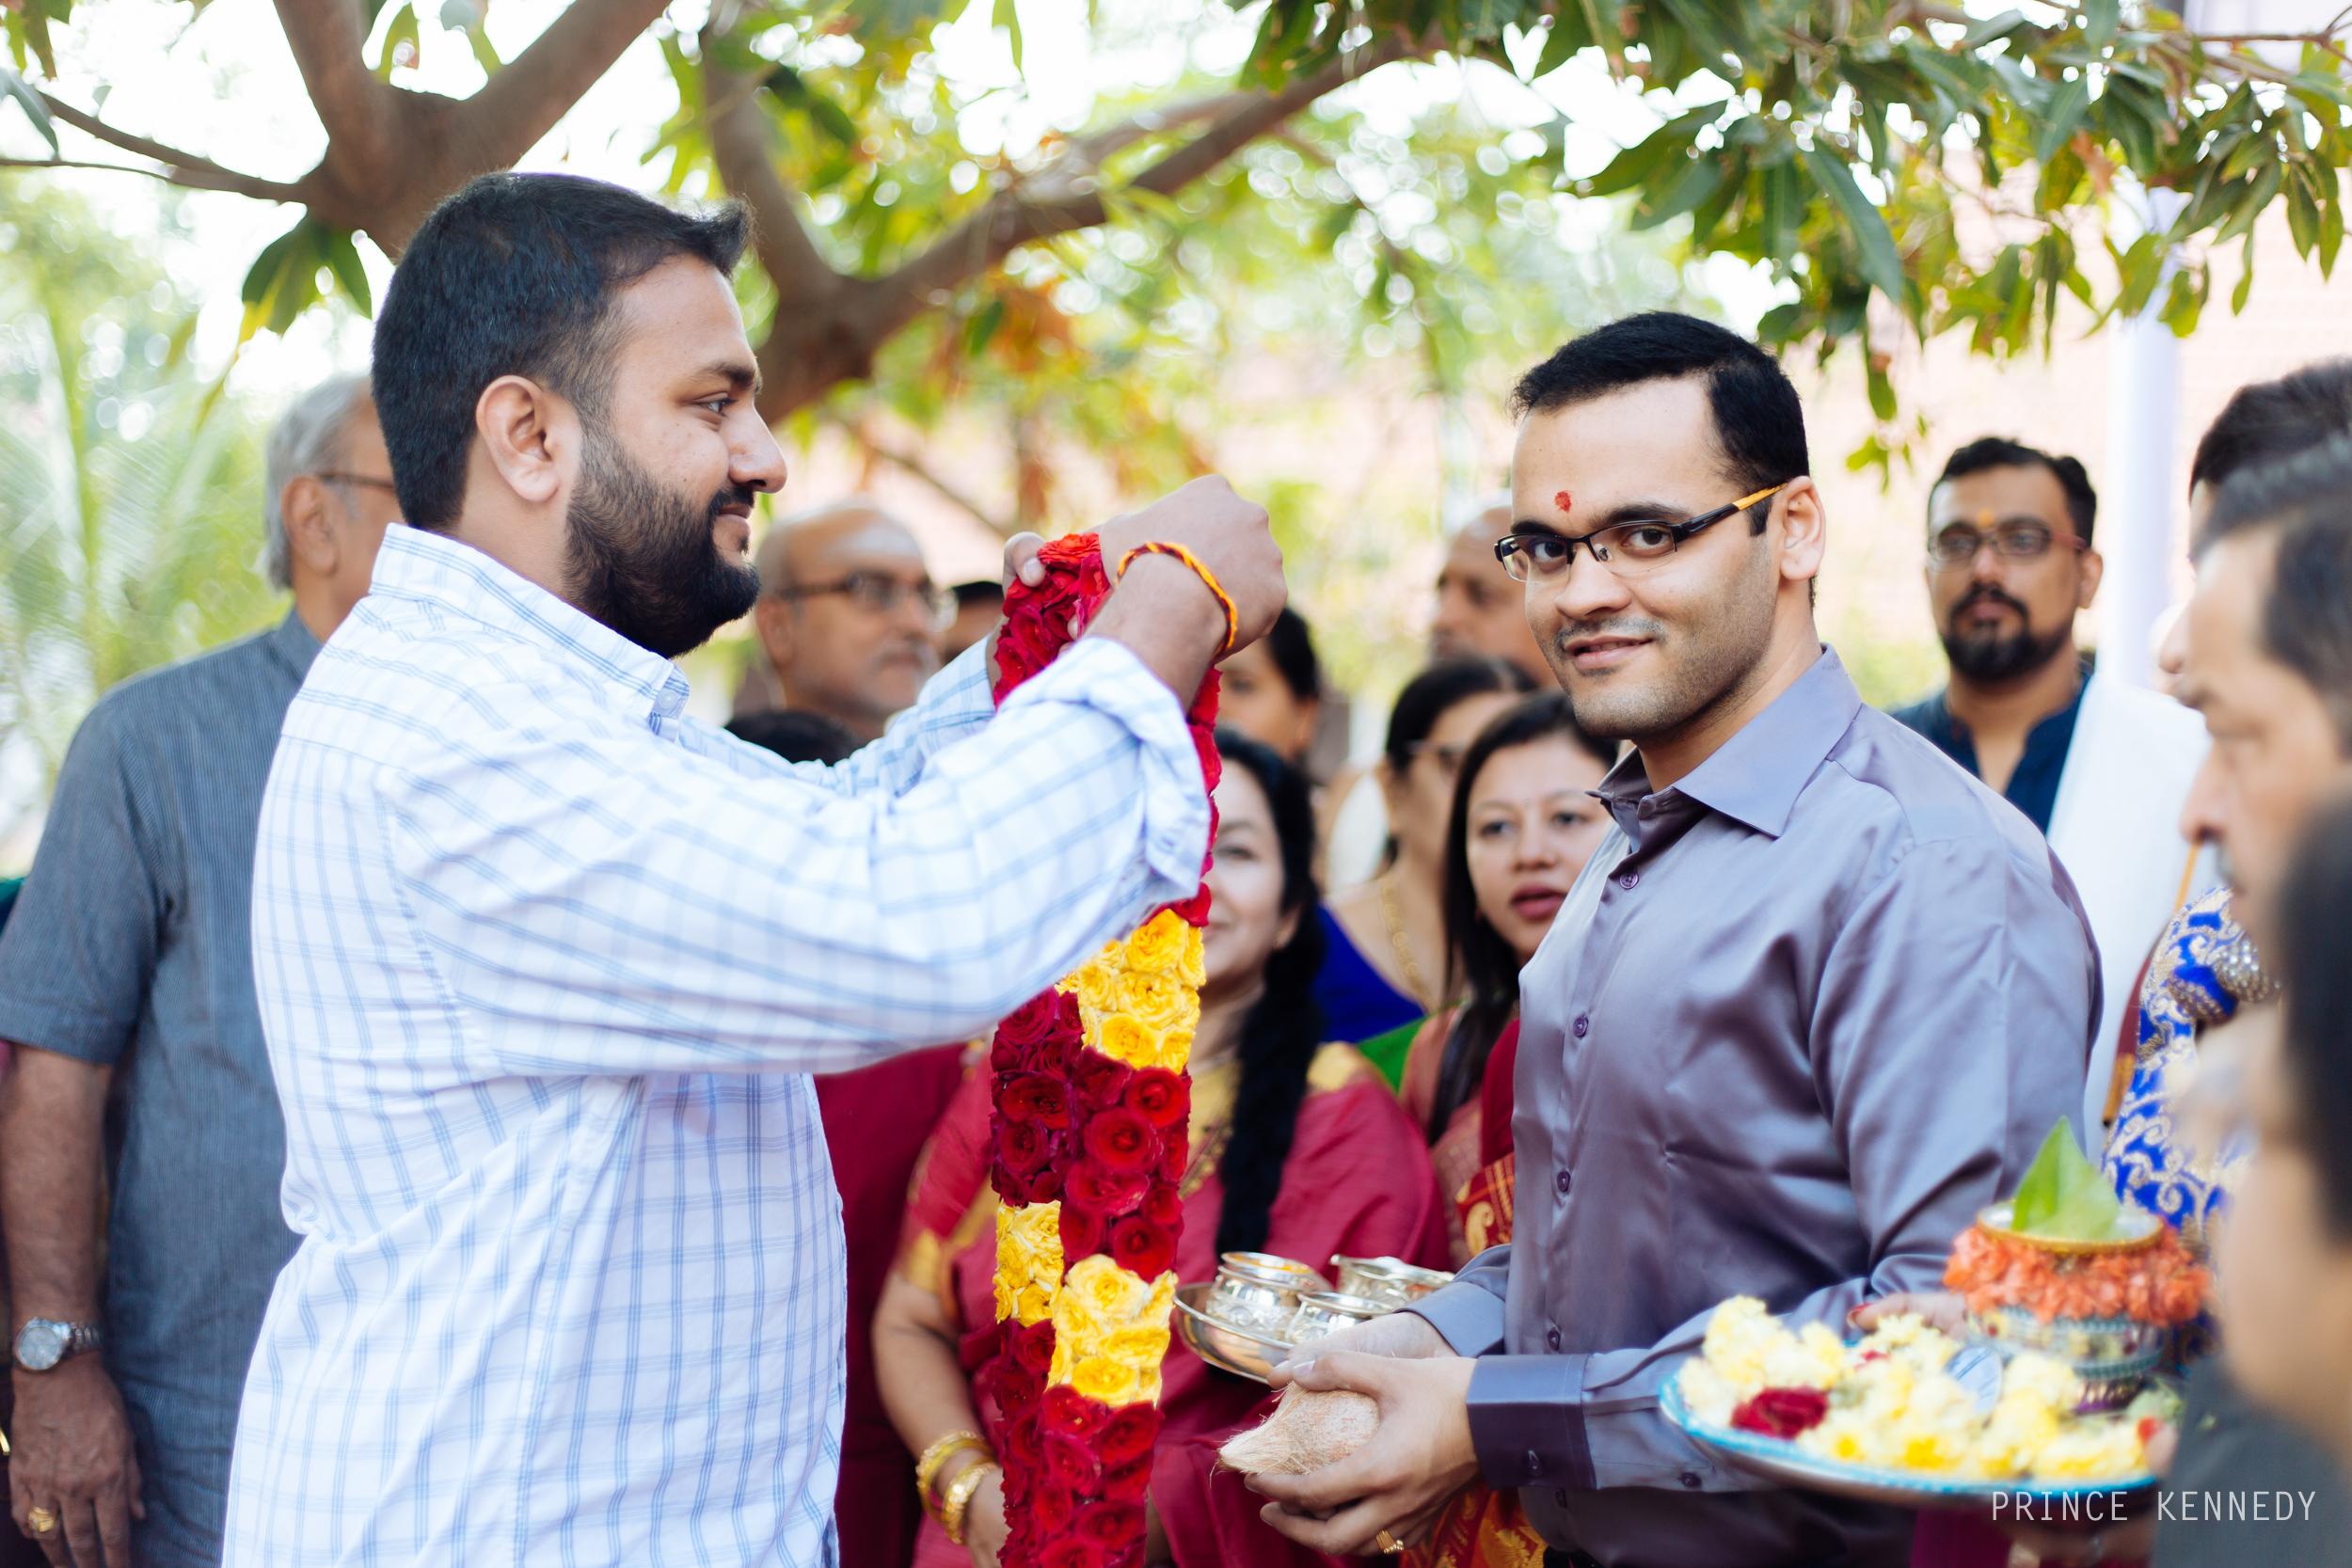 Athmajja-Nithesh-Engagement-Couple-Portrait-Portraiture-Wedding-Couple-Portrait-Chennai-Photographer-Candid-Photography-Destination-Best-Prince-Kennedy-Photography-68.jpg